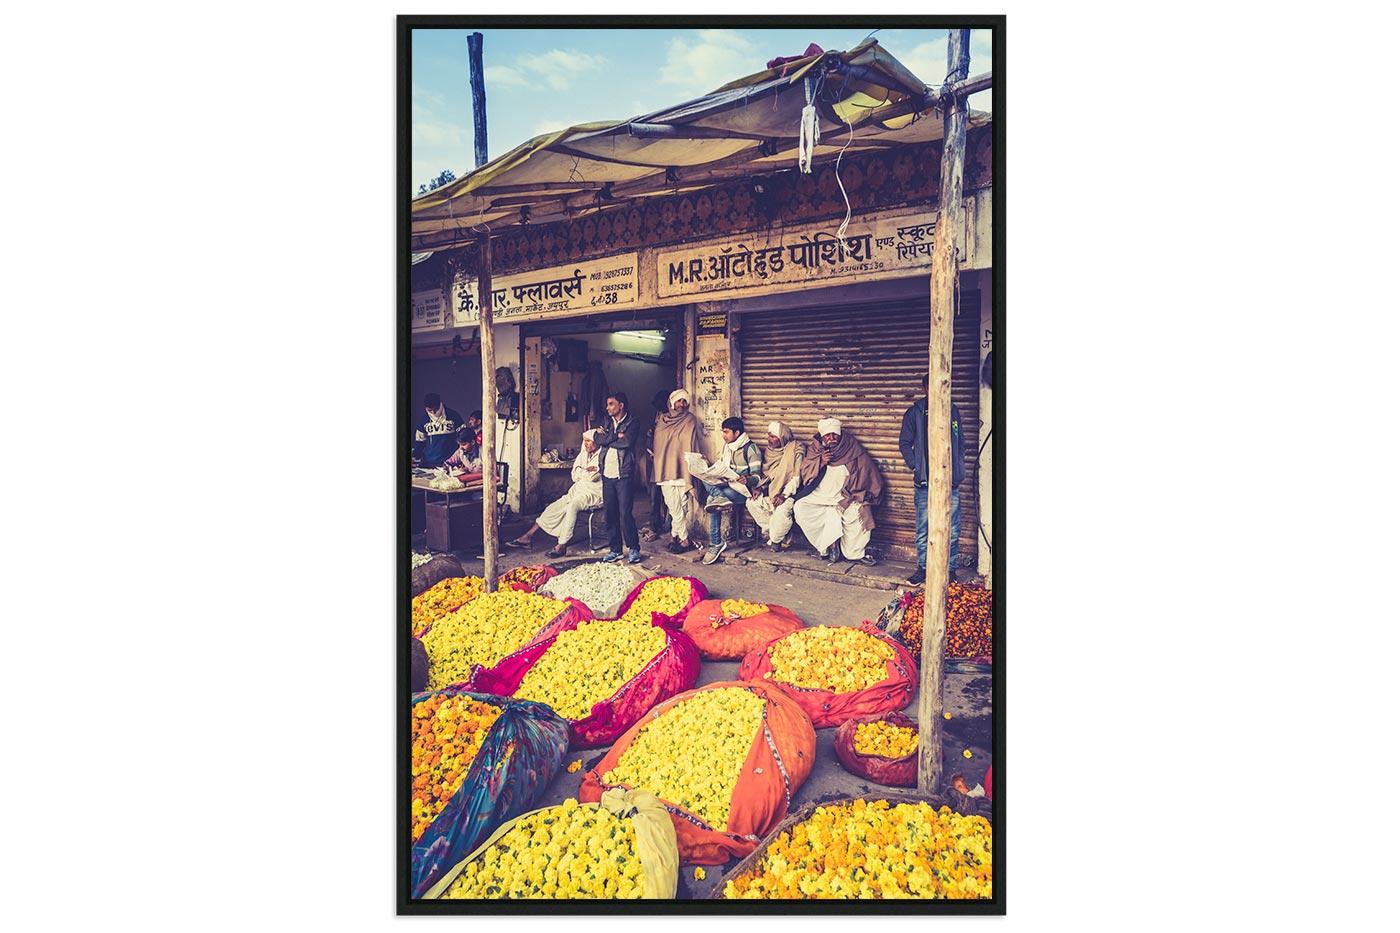 Caisse americaine Flower market